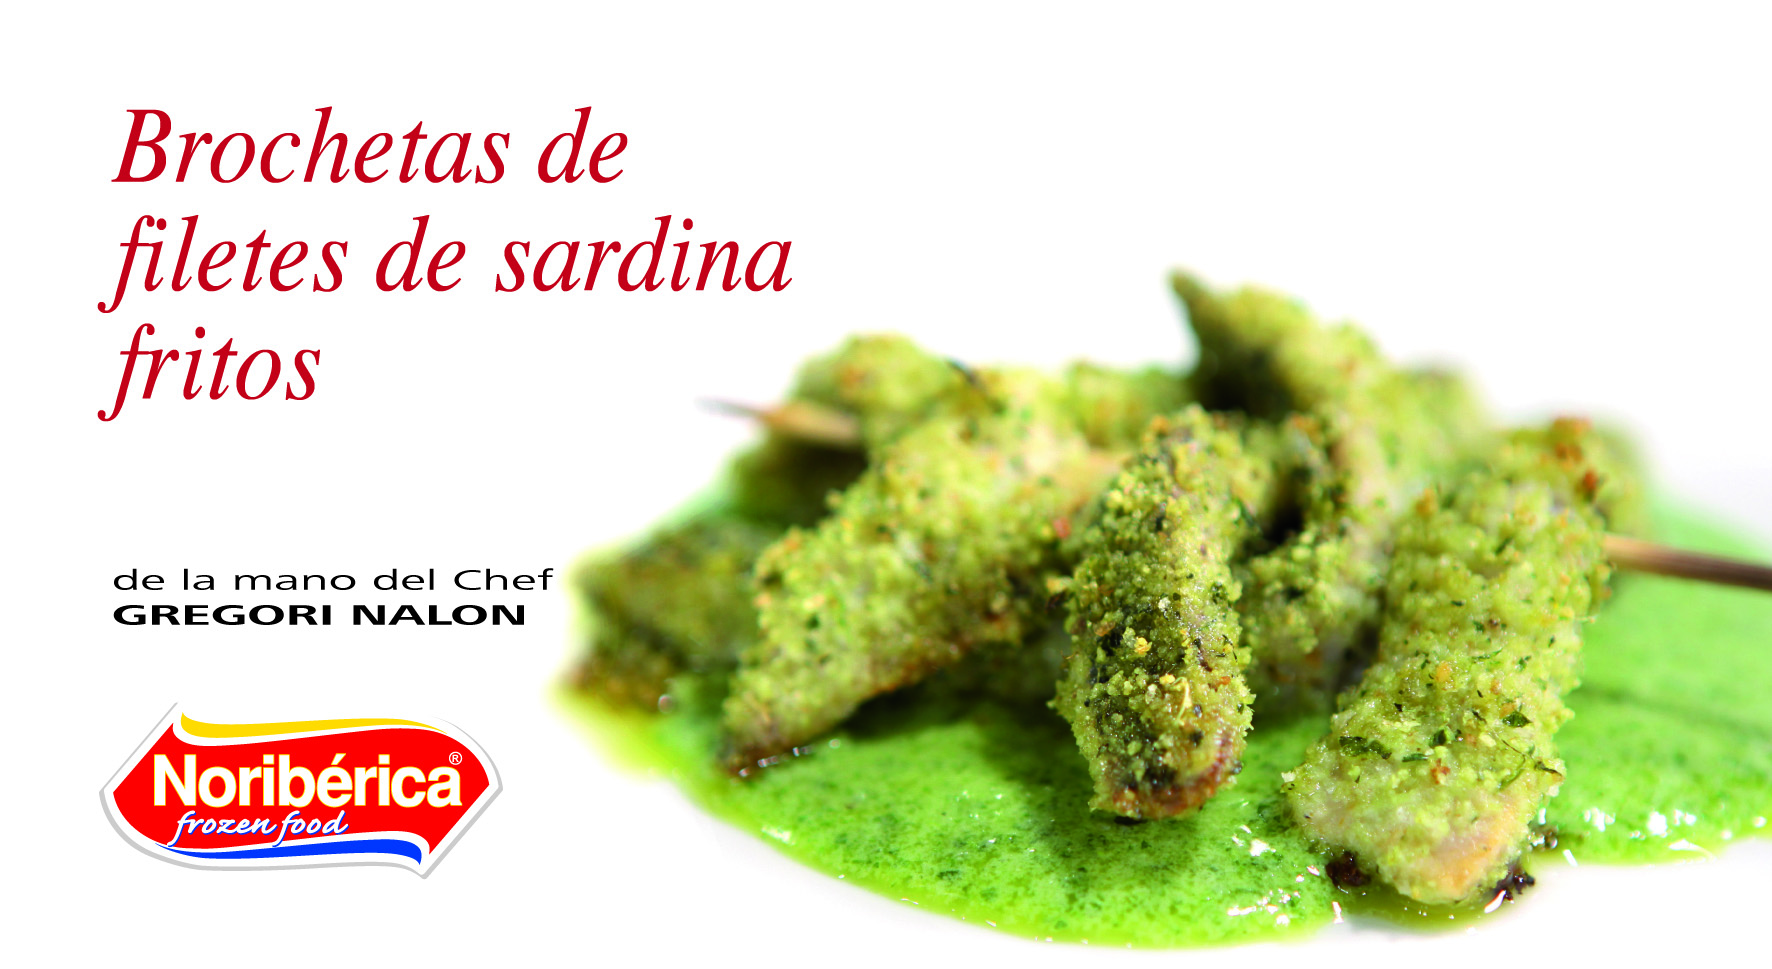 brochetas de filetes de sardina